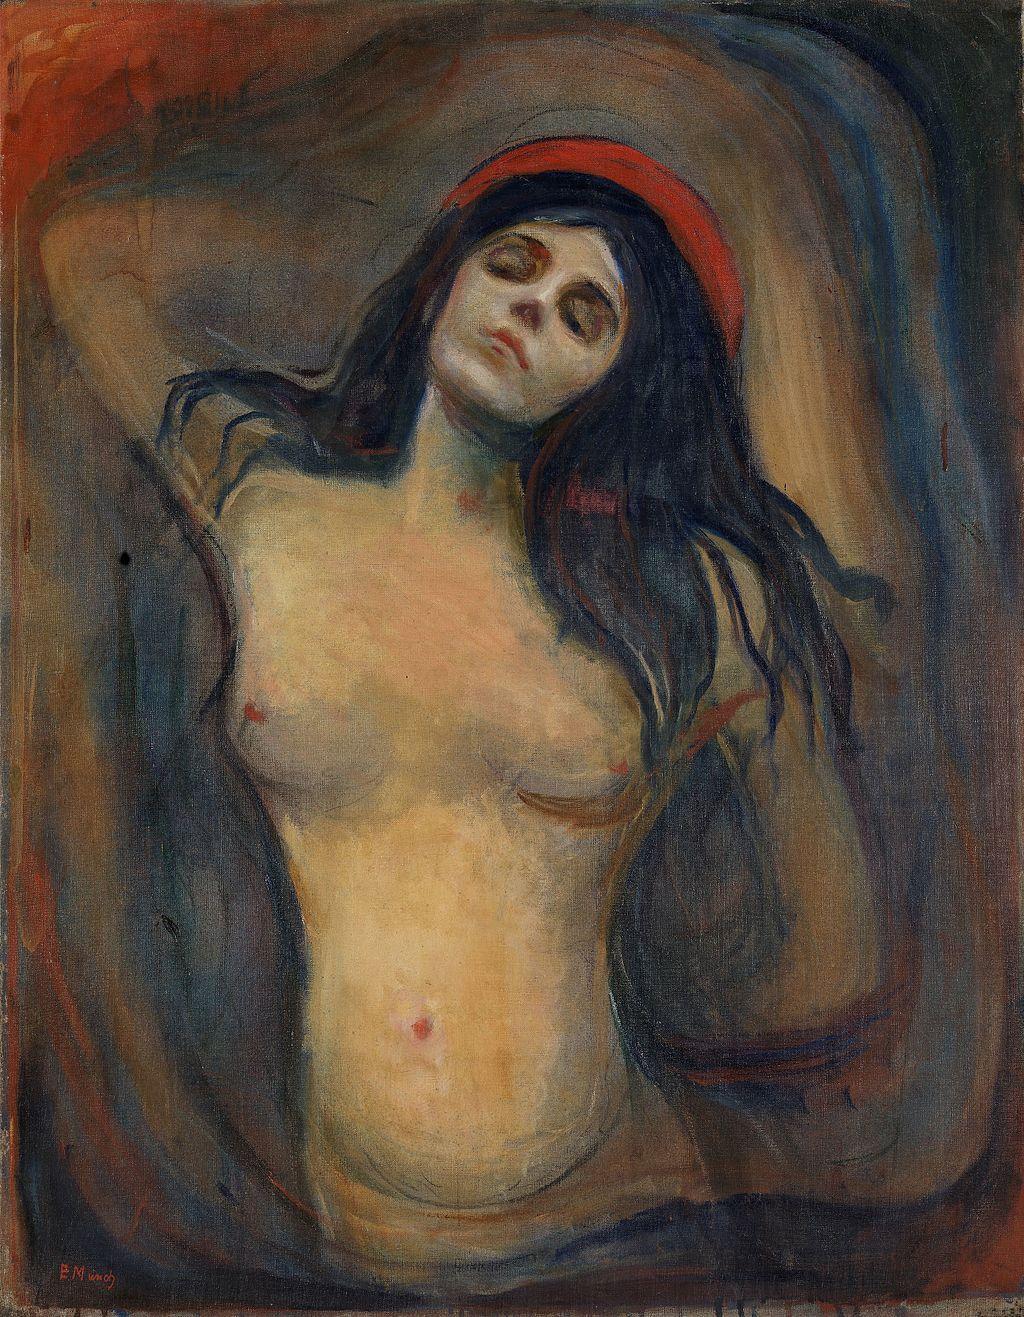 Madonna cuadro Edvard Munch